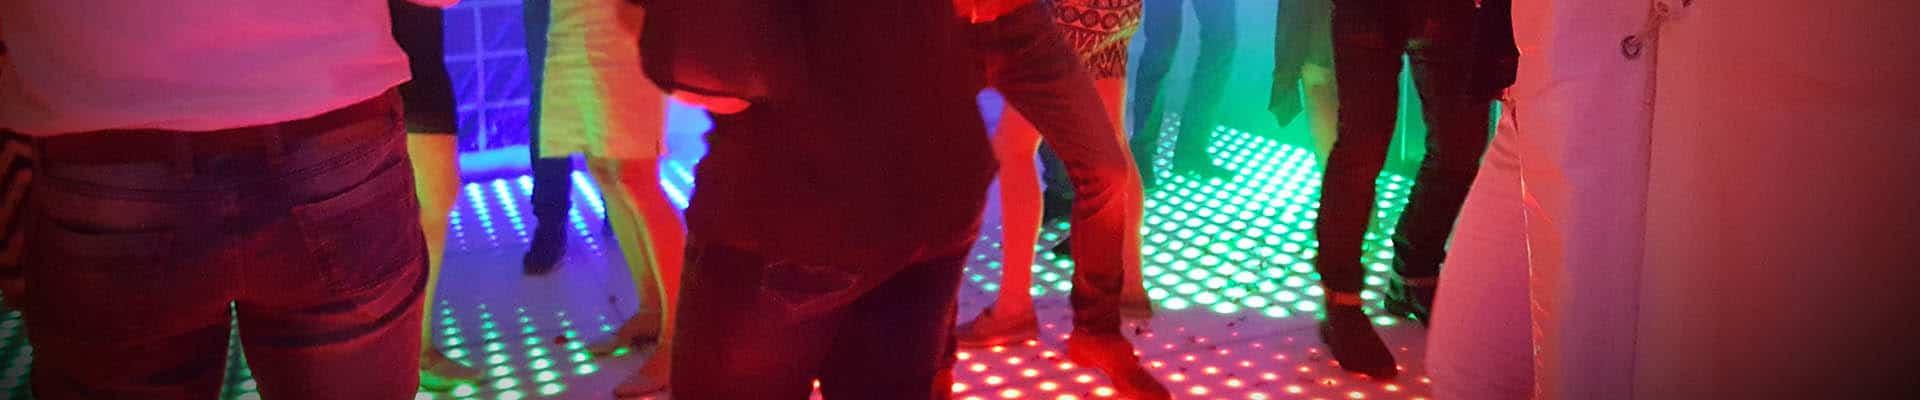 led dansvloer bij feest dj venlo